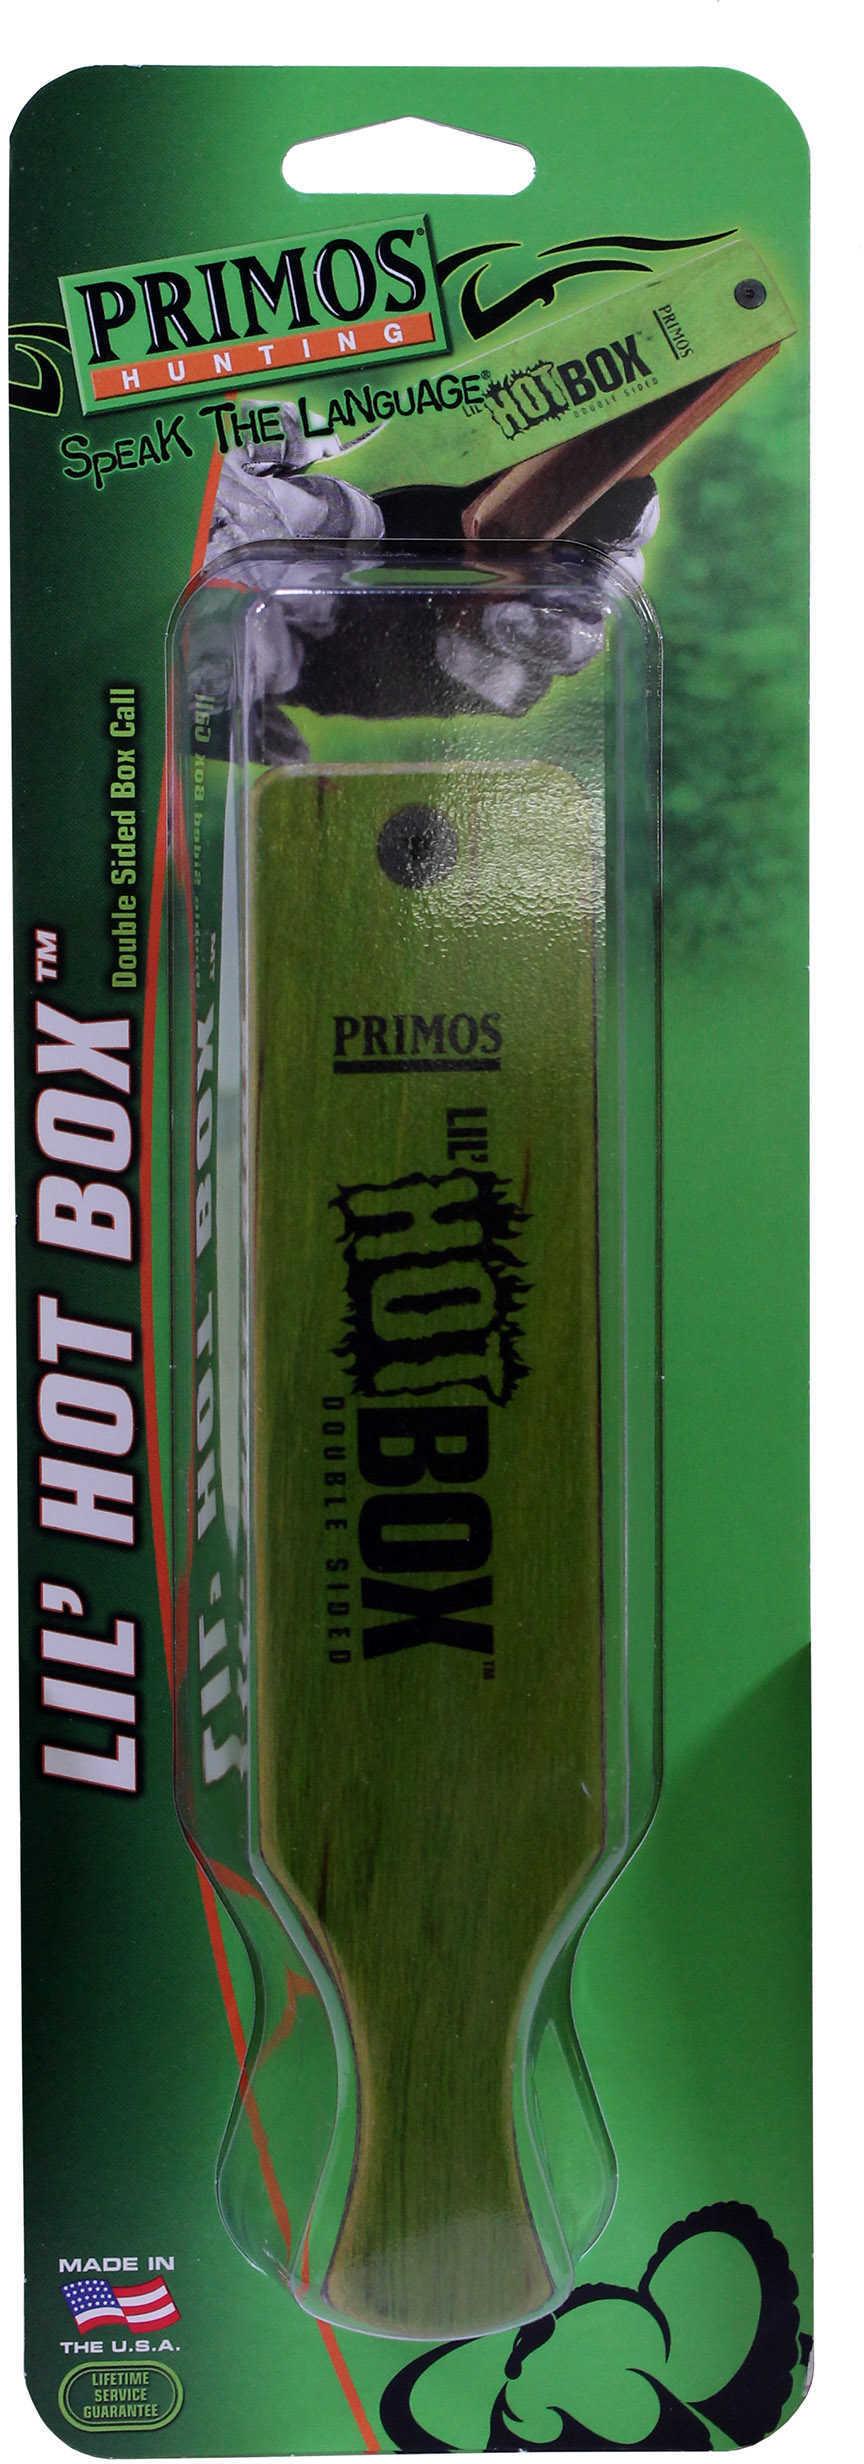 PRIM LIL' HOT BOX MAHOGANY BOXCALL